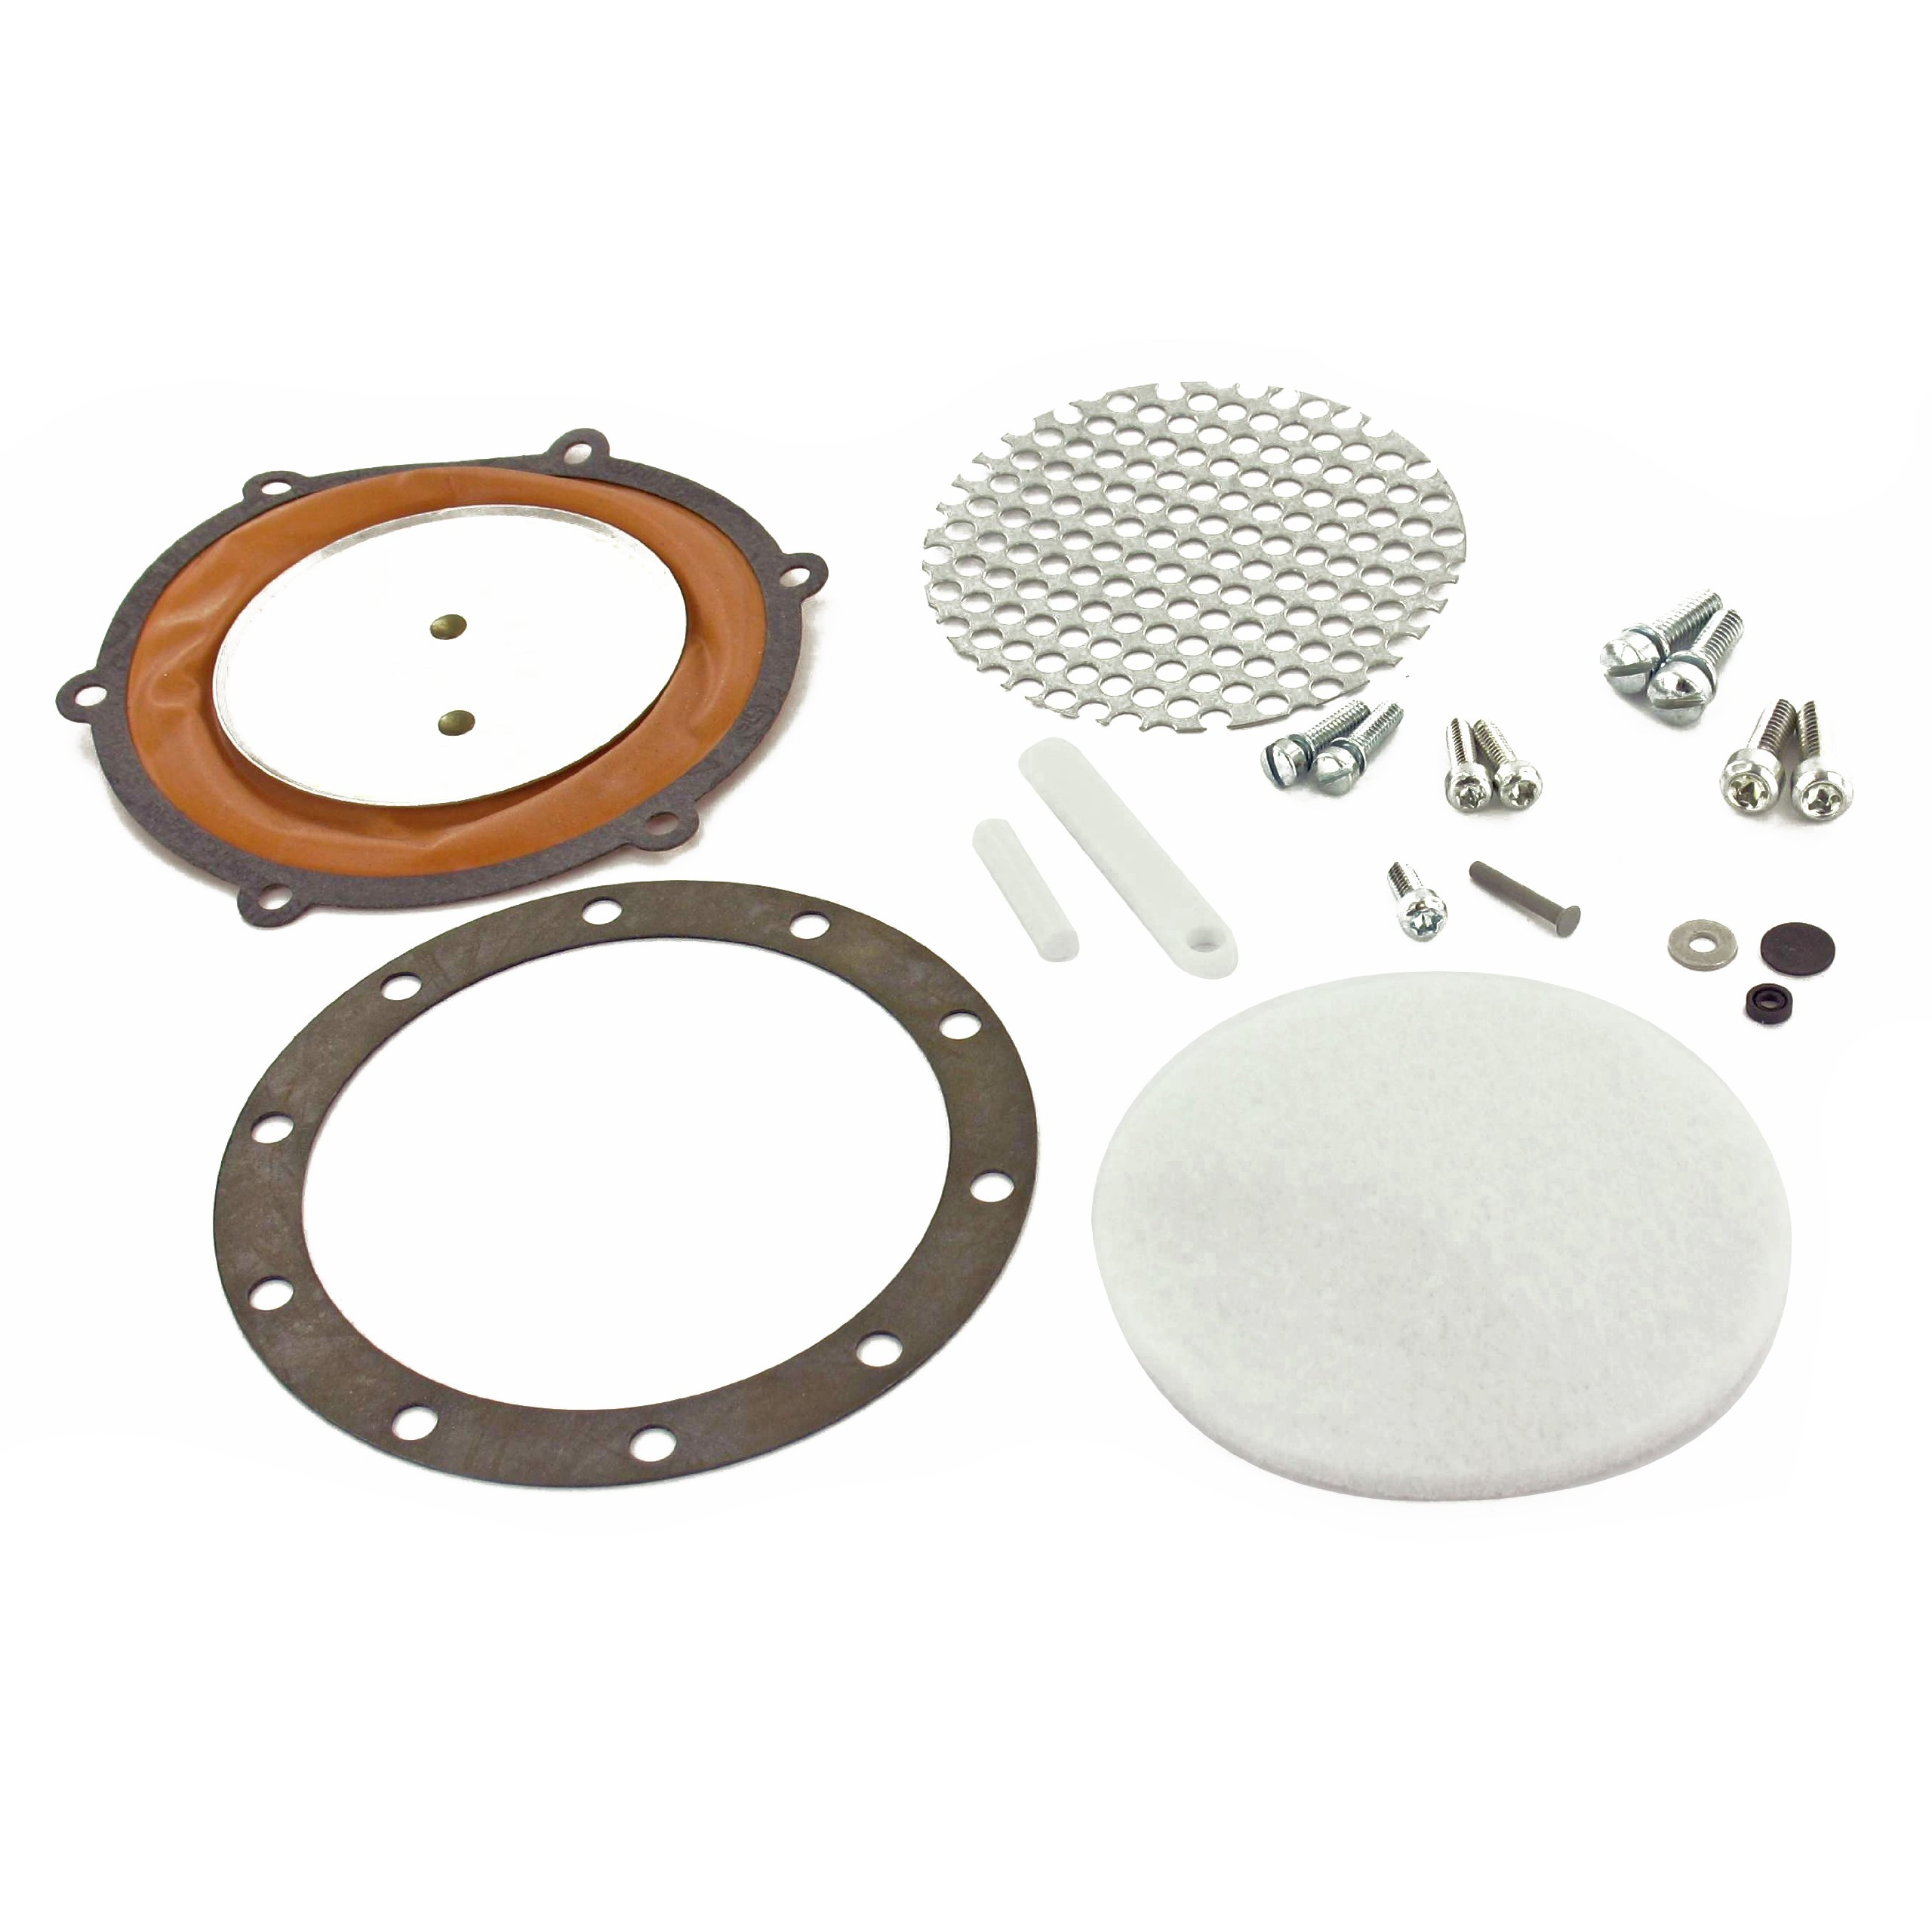 IMPCO RK-VFF30-2 Silicone Generic Fuel Lockoff Repair Kit